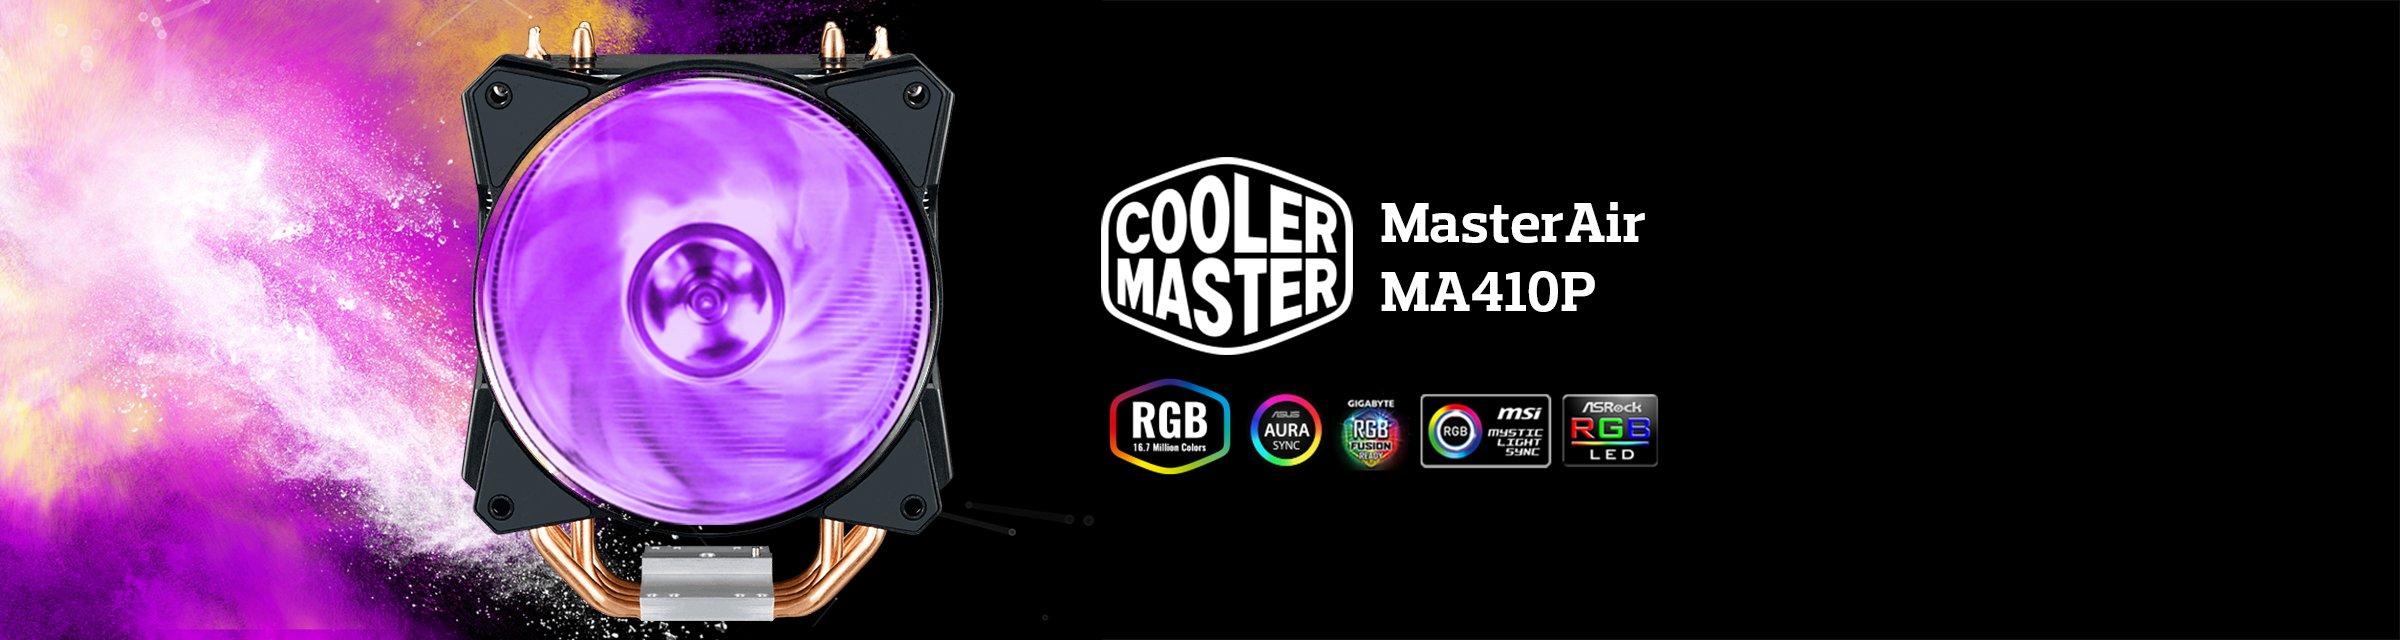 Cooler Master MasterAir MA410P CPU Air Cooler